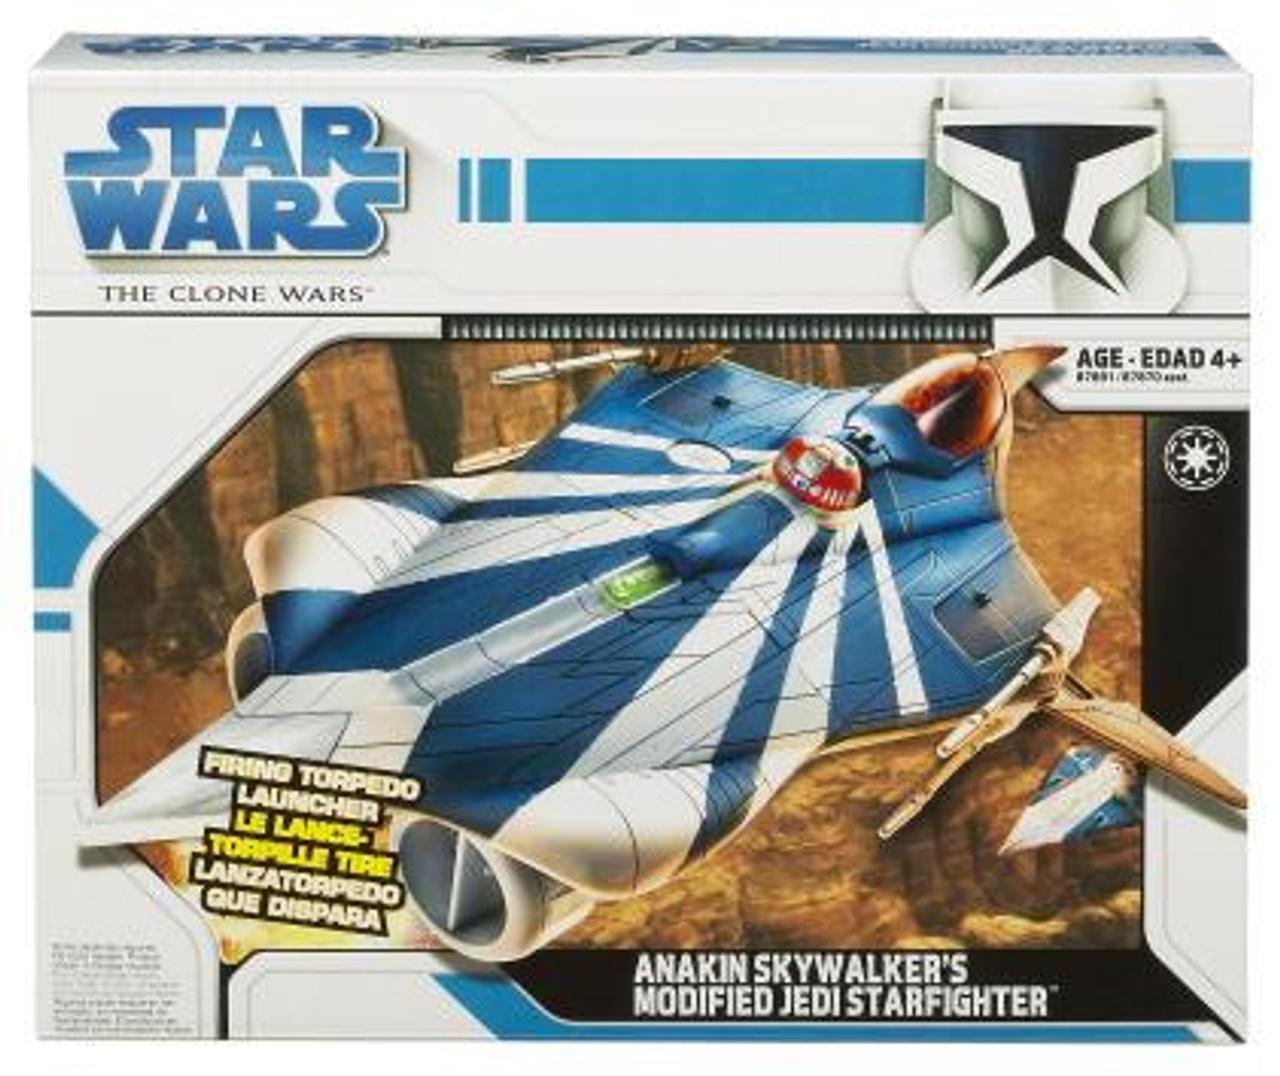 Star Wars The Clone Wars Vehicles 2008 Anakin Skywalker's Modified Jedi Starfighter Action Figure Vehicle